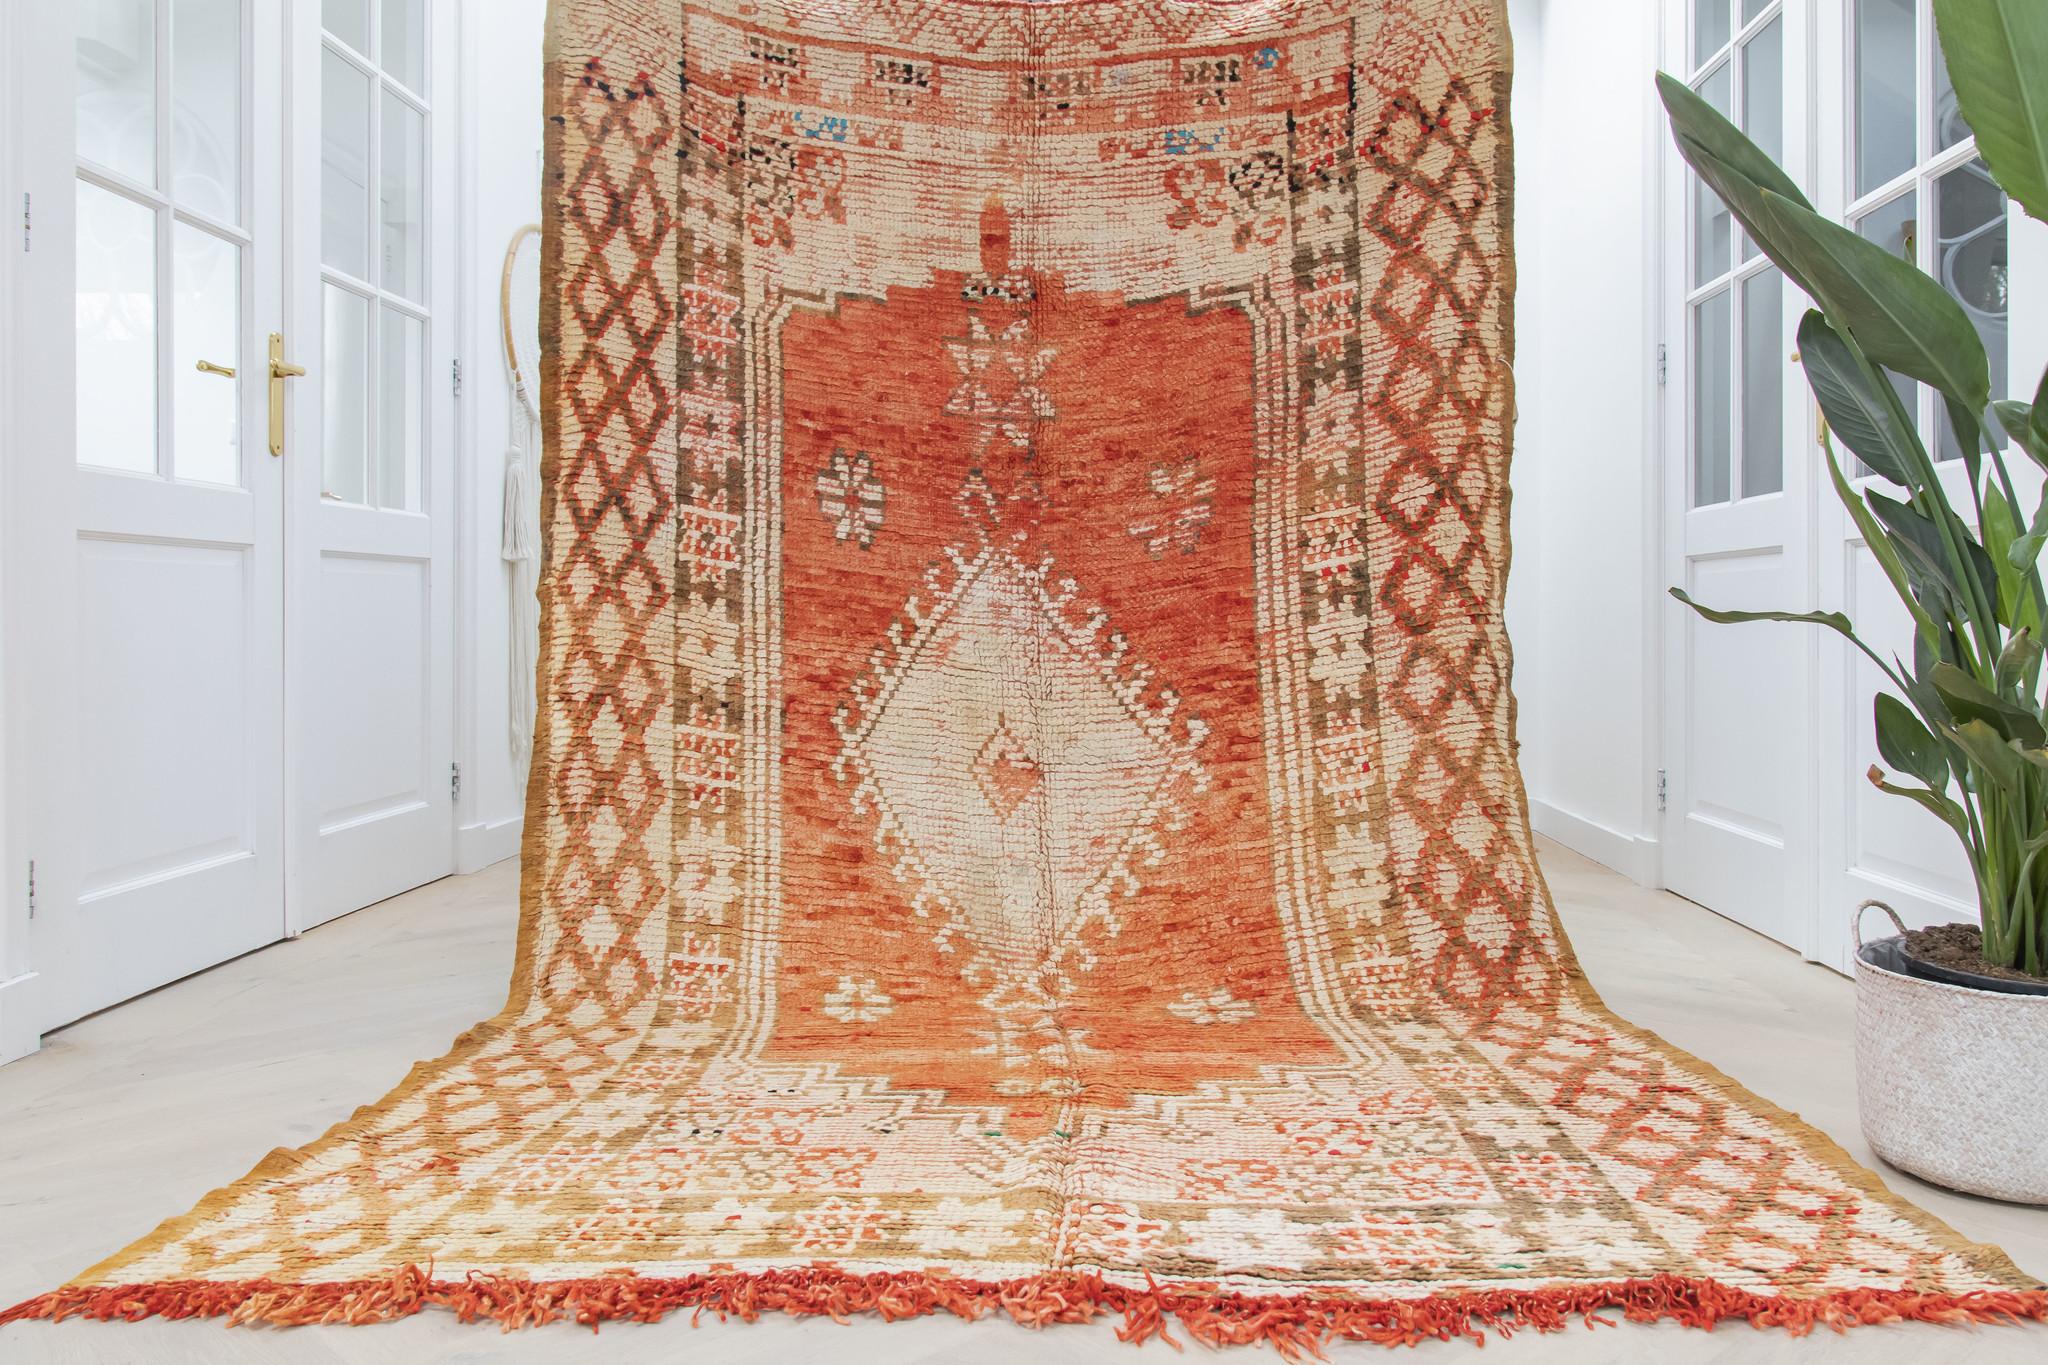 Simply Pure Handgefertigter Vintage Boujaad  Berber-Teppich aus Marokko 172 x 295 cm